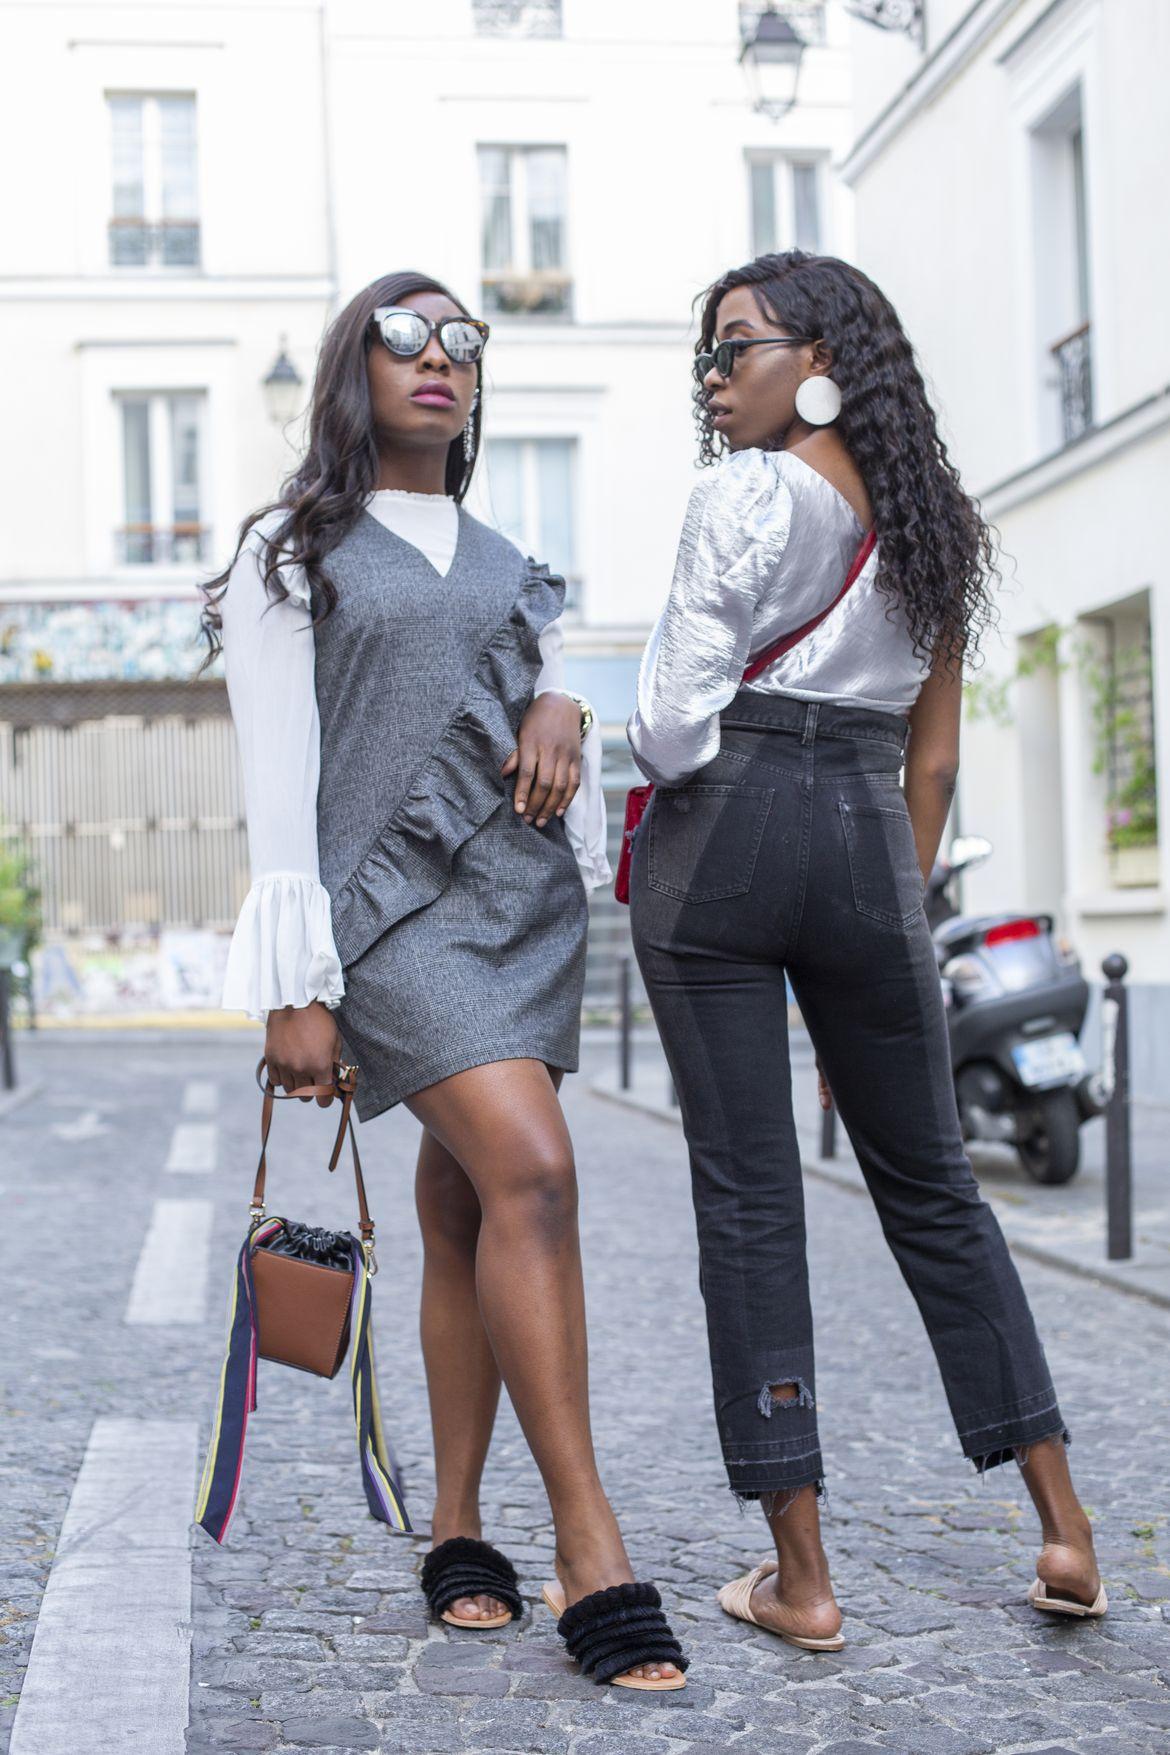 Golden Connexion : metallic grey looks black bloggers